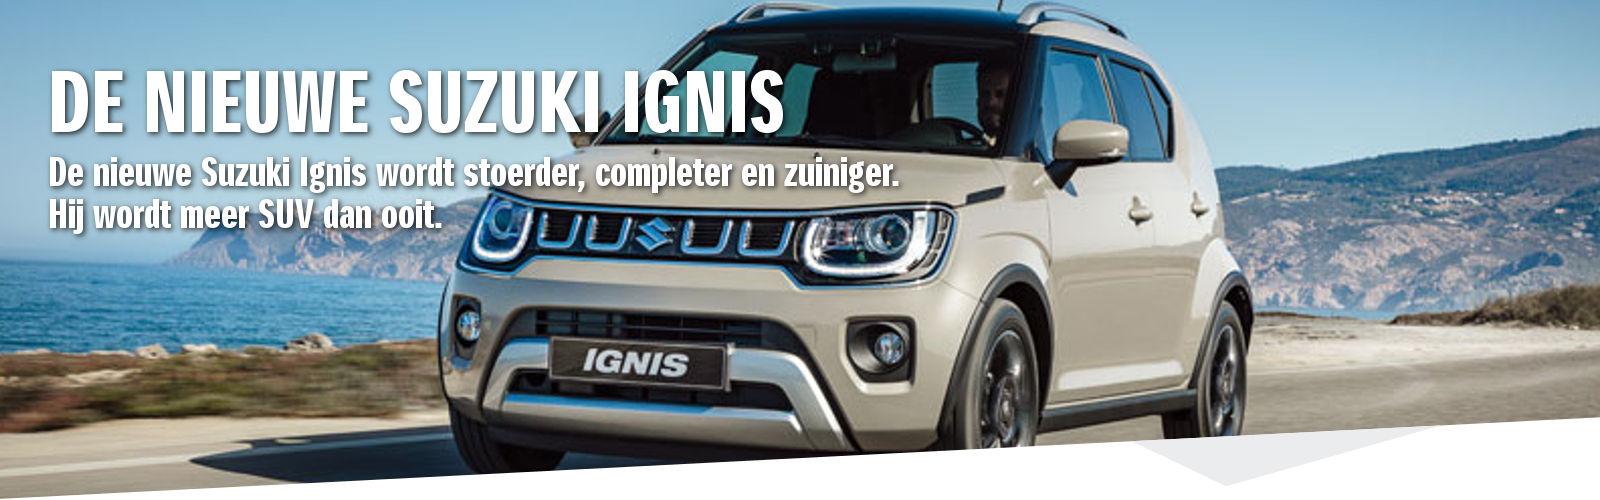 Mengelers Suzuki - Nieuwe Suzuki Ignis